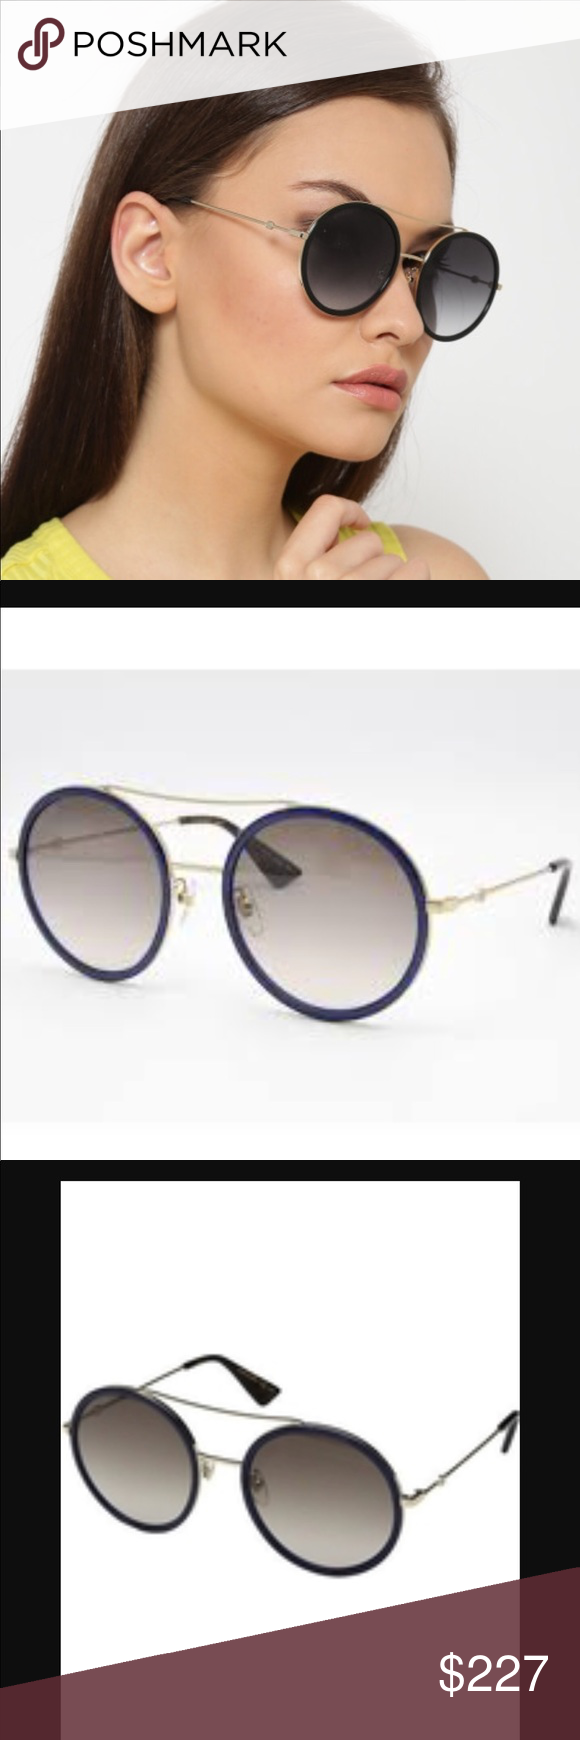 ad63fec6b0 Gucci Sunglasses Model  0061s Gucci 0061s Blu gld Brand New!🎈 Case and  Cleaning Cloth Included! Gucci Accessories Sunglasses